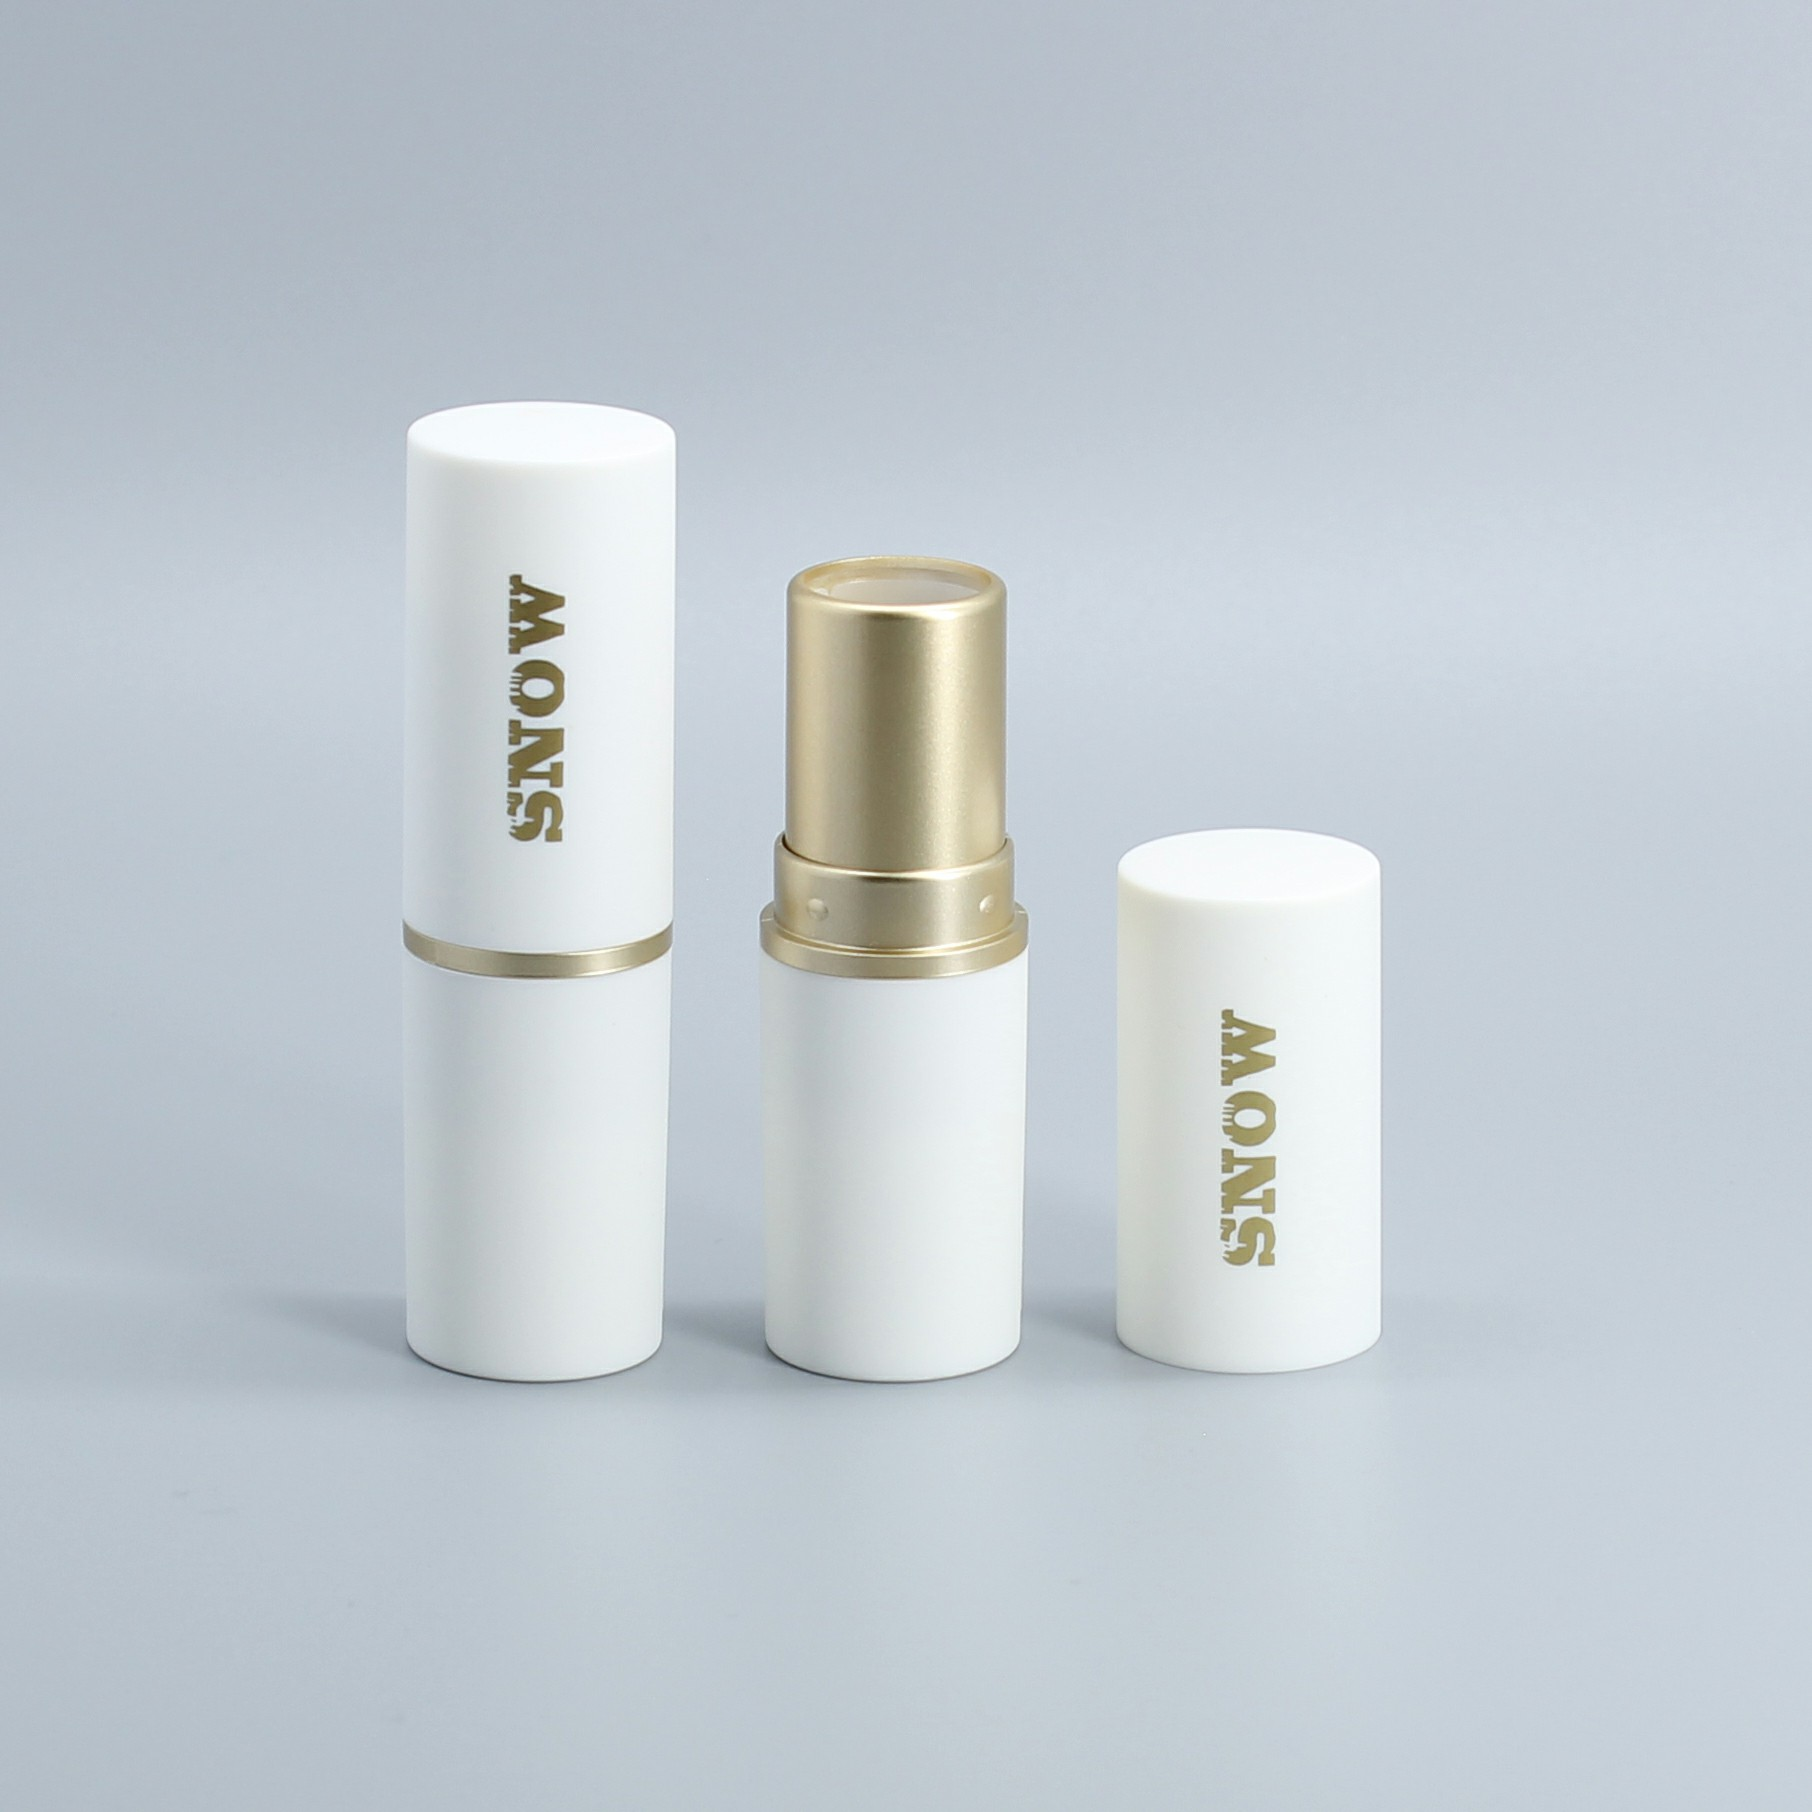 कस्टम सफेद प्लास्टिक खाली दौर लिपस्टिक ट्यूब पैकेजिंग सोने के साथ मध्य अंगूठी